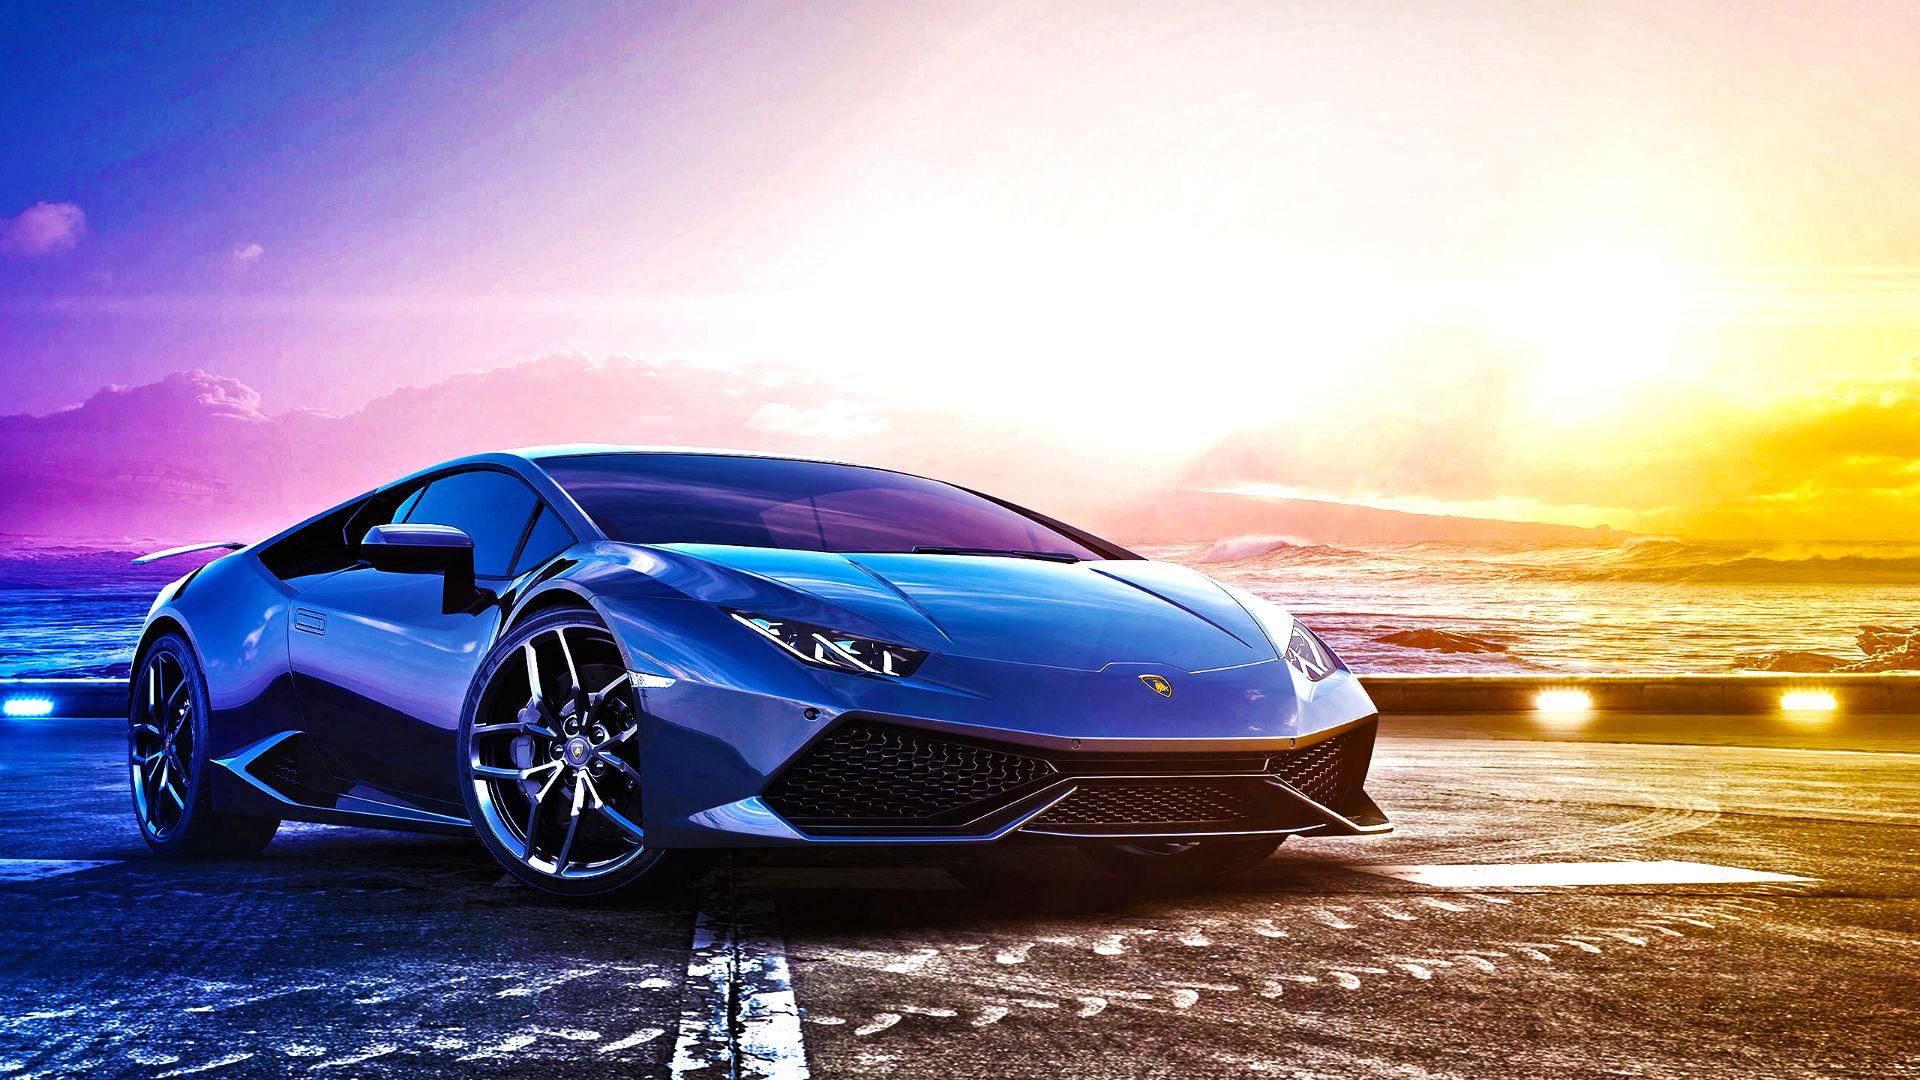 Lamborghini Wallpapers HD